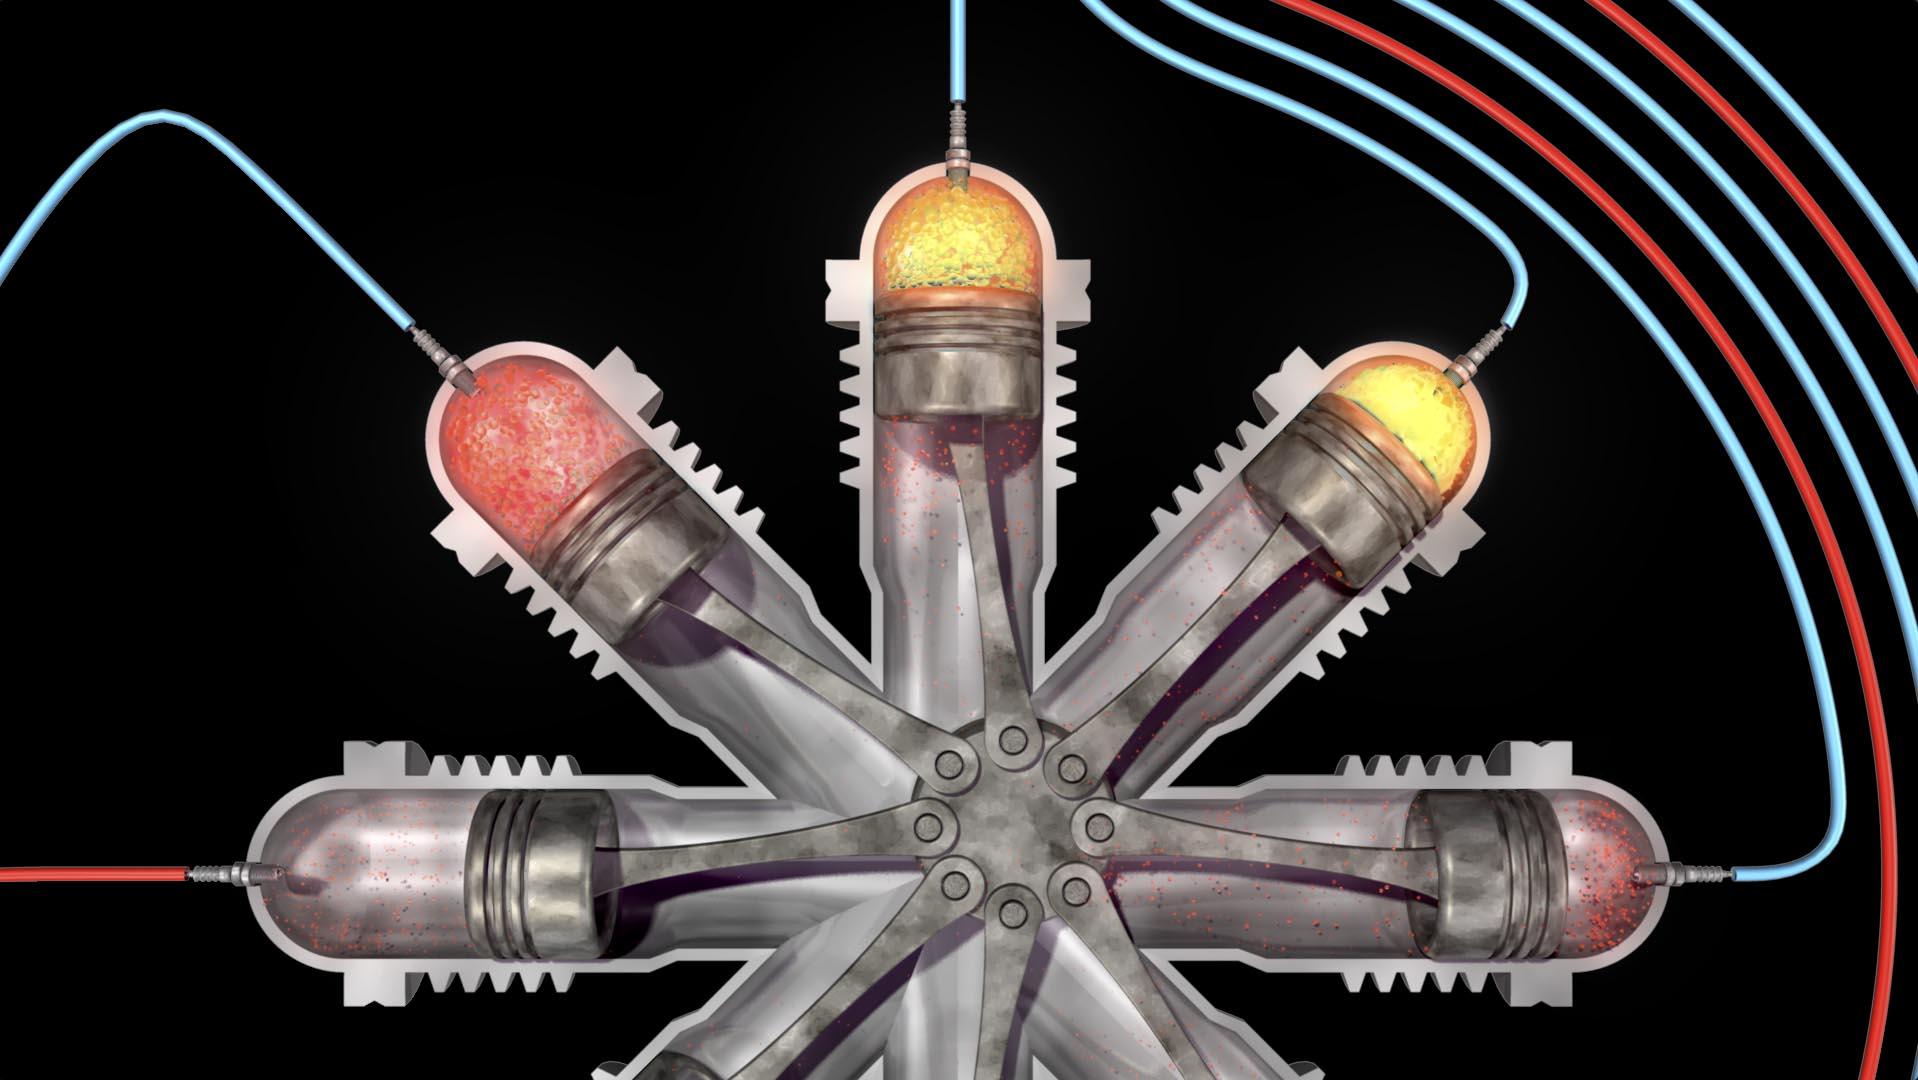 Cisco Firepower 9300 Launhc Video